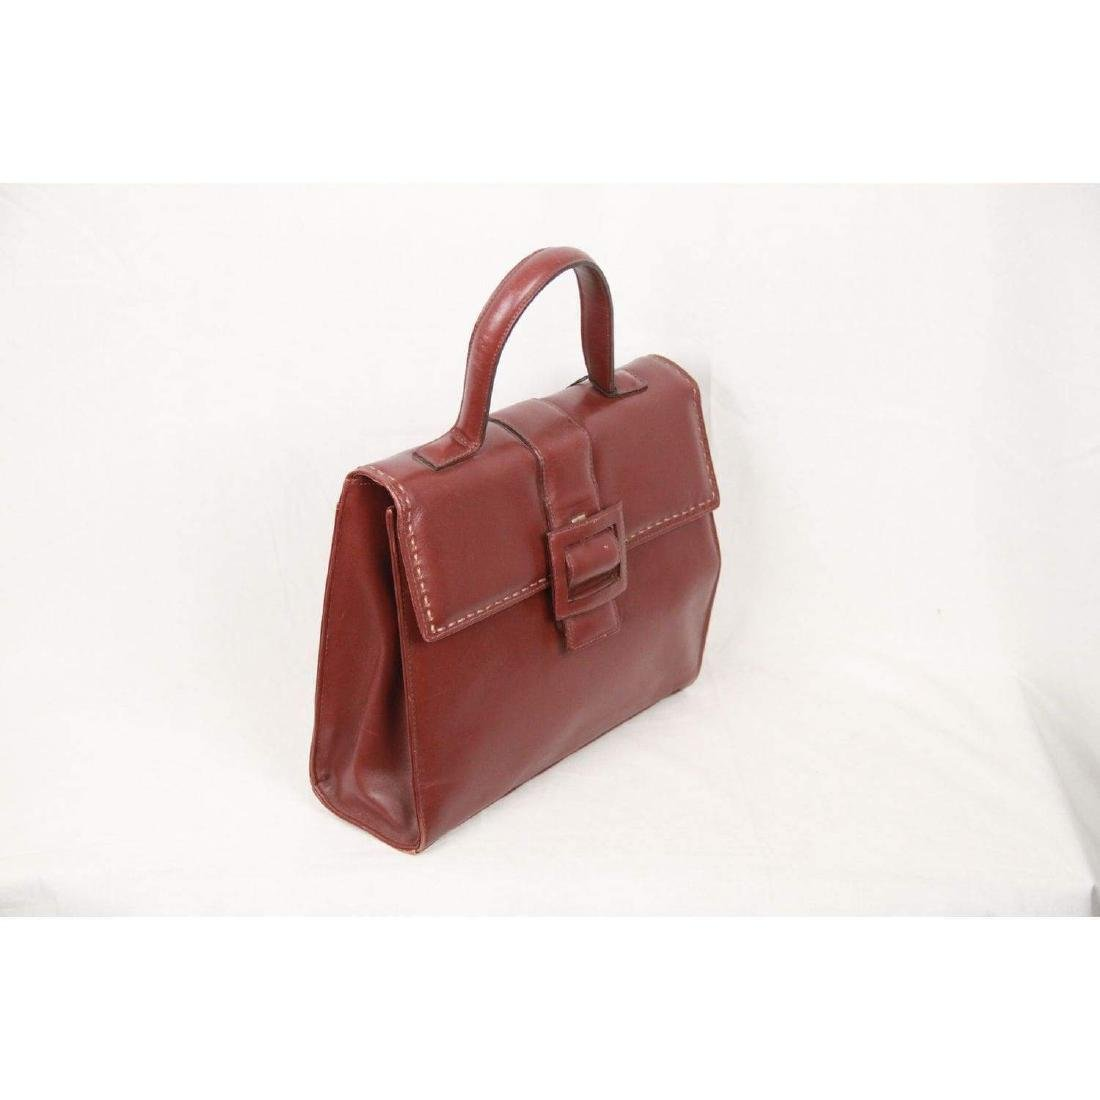 MONTENAPOLEONE Vintage Brown Leather HANDBAG - 2